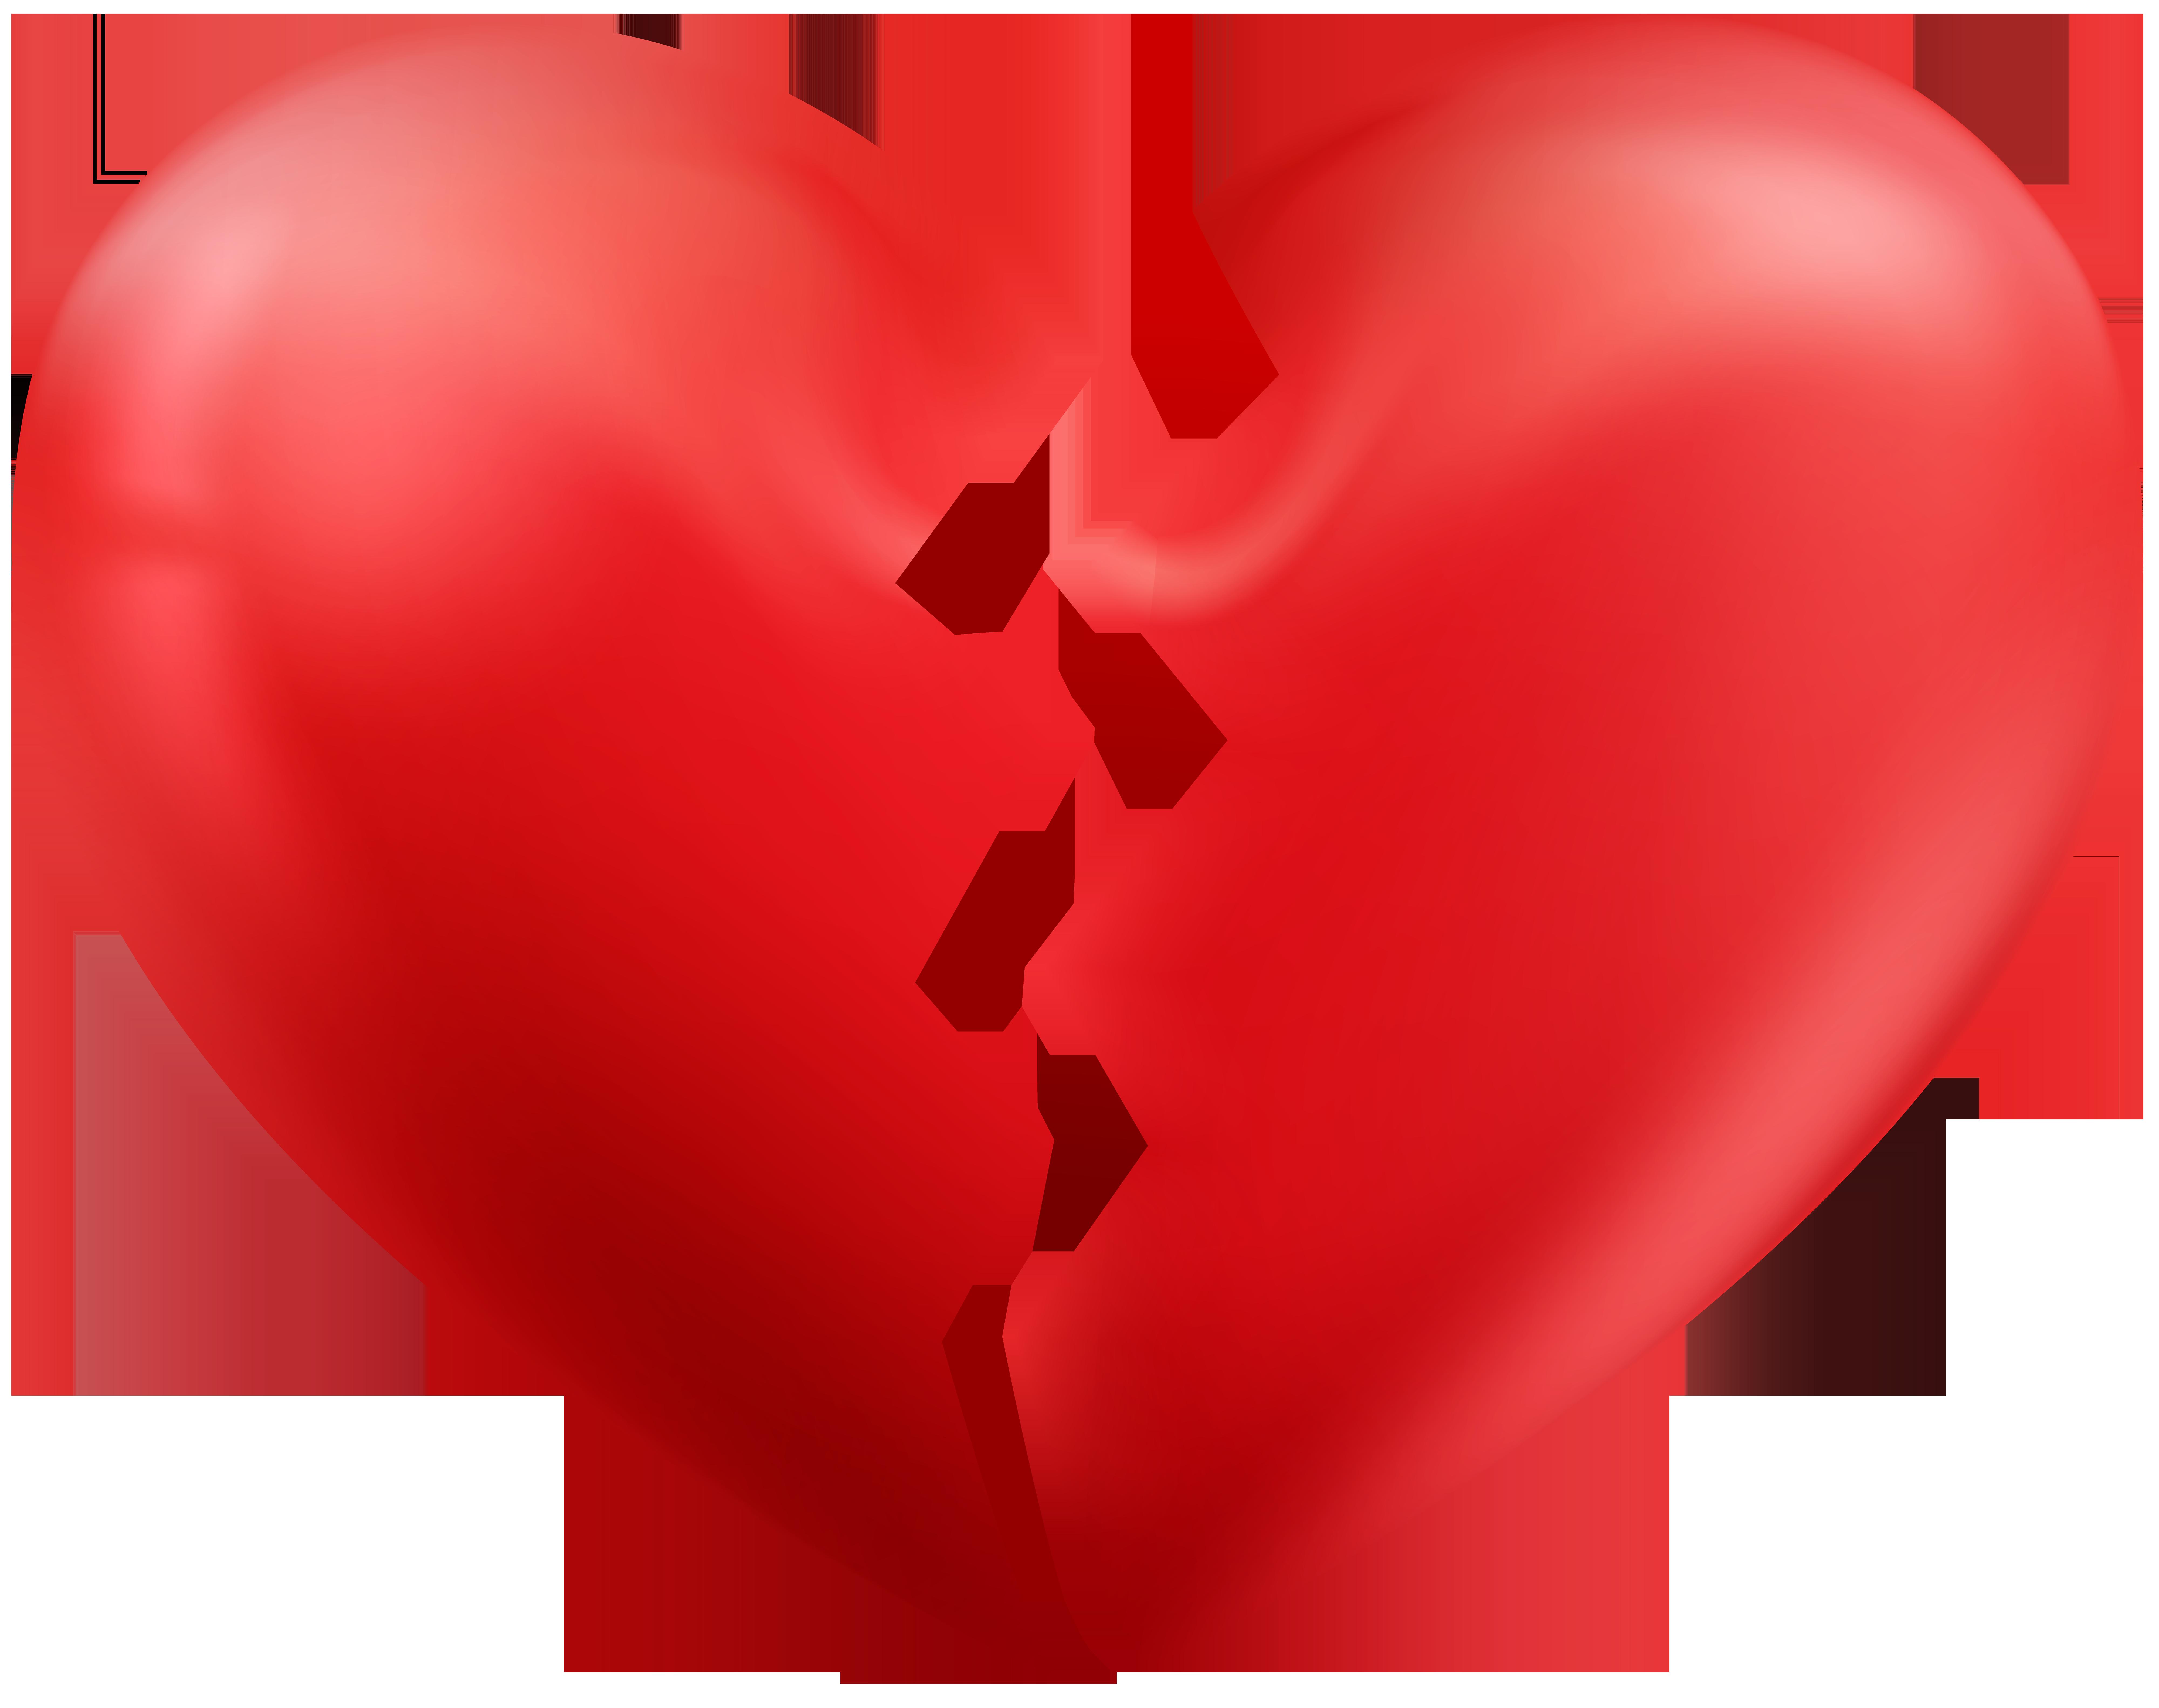 Broken Heart Transparent PNG Clip Art Image.